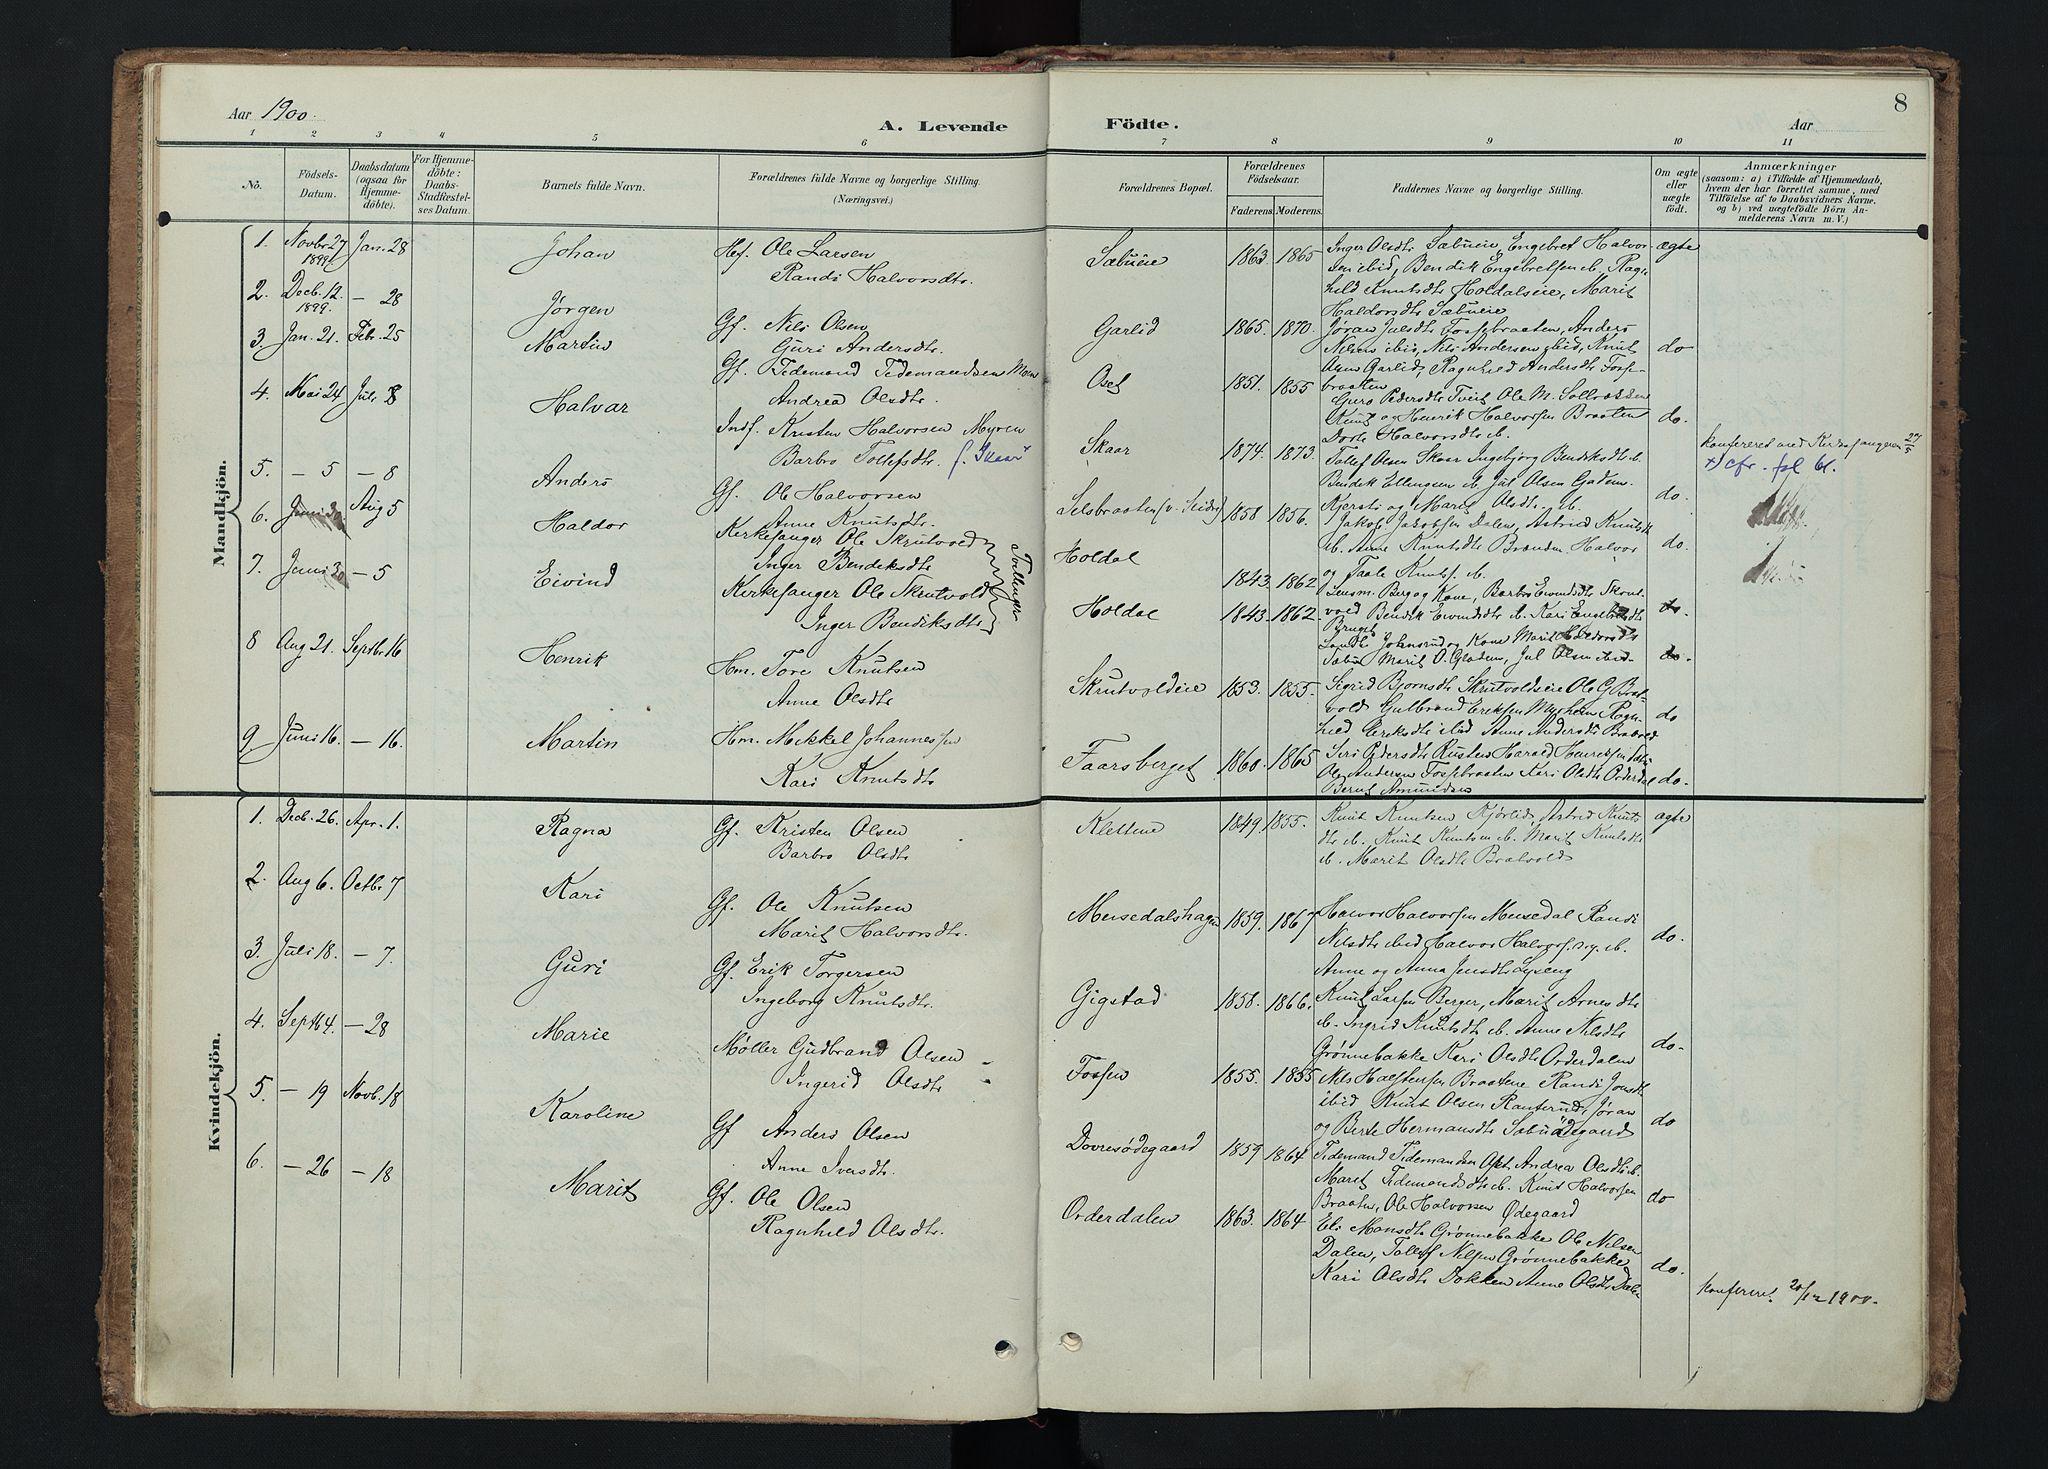 SAH, Nord-Aurdal prestekontor, Ministerialbok nr. 15, 1896-1914, s. 8